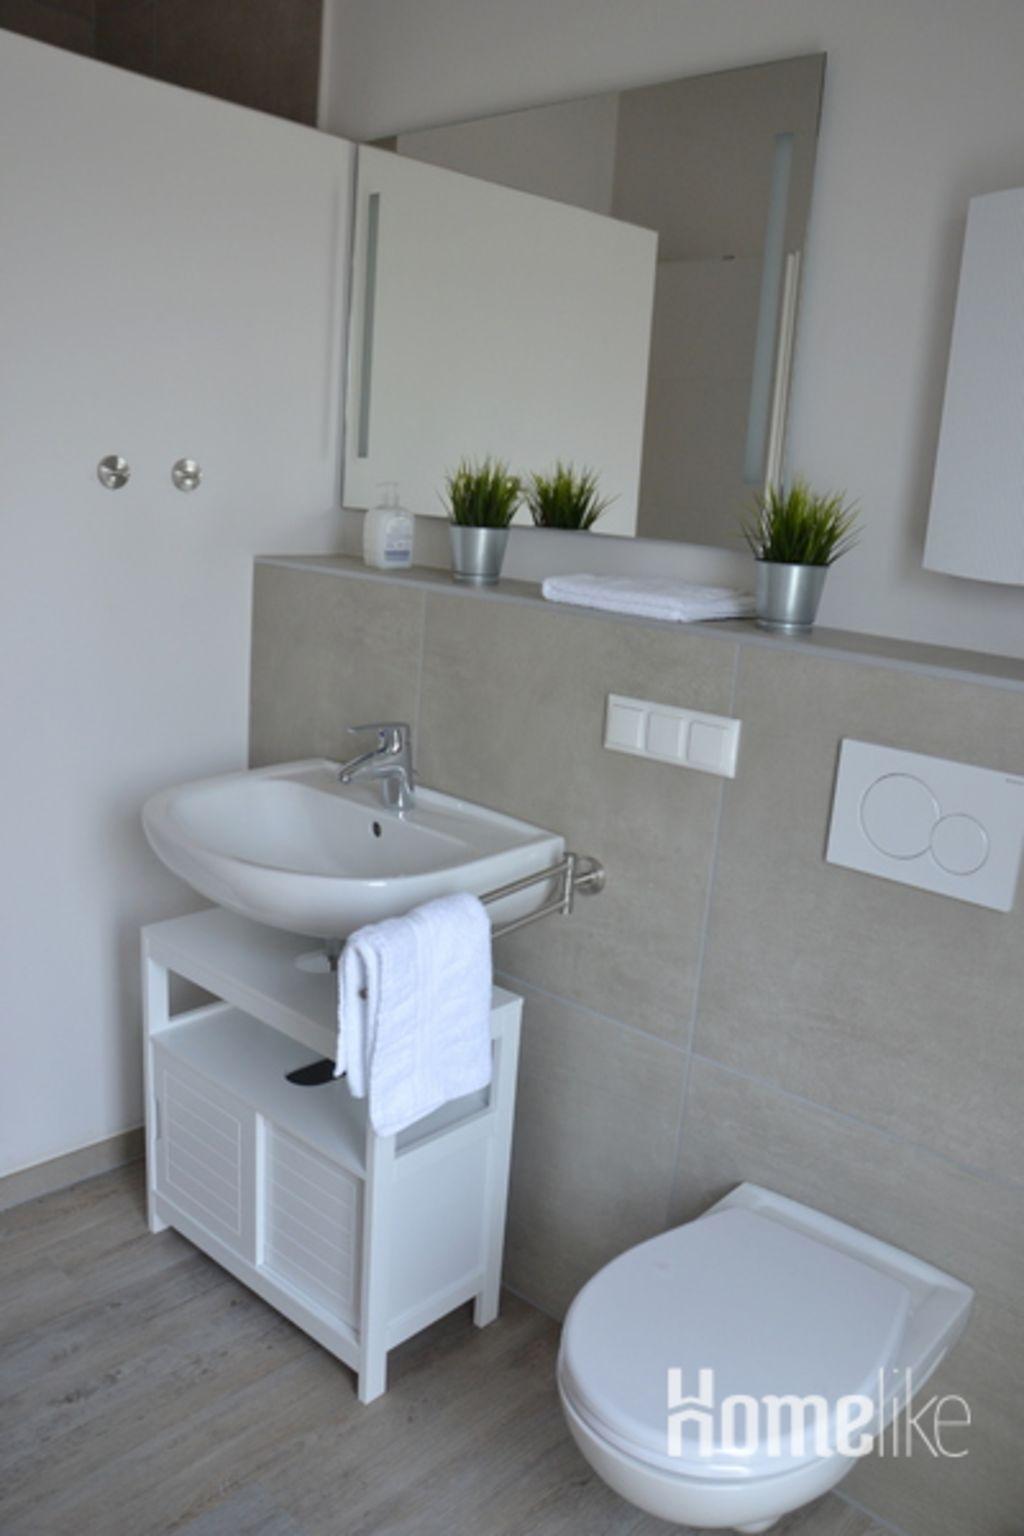 image 4 furnished 1 bedroom Apartment for rent in Rommerskirchen, Rhein-Kreis Neuss